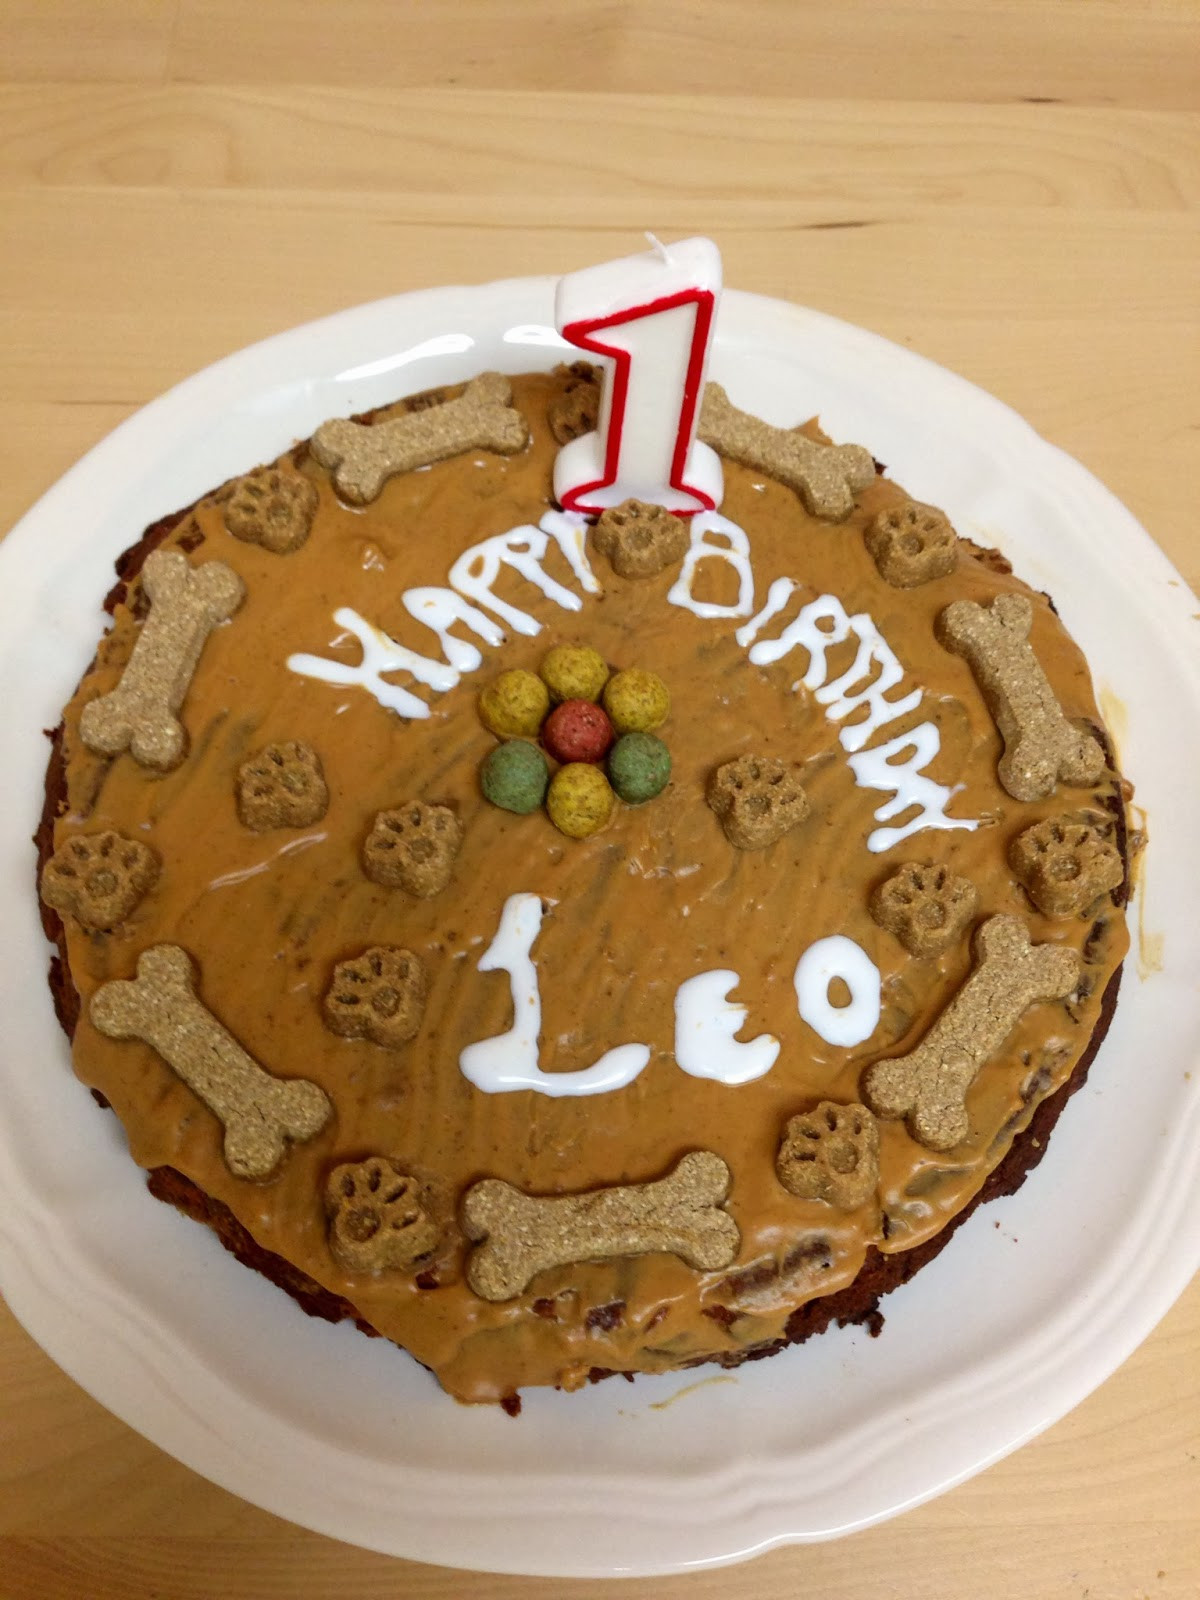 Healthy Dog Birthday Cake Recipes  Les Bananas Prince Leo s First Birthday Healthy Dog